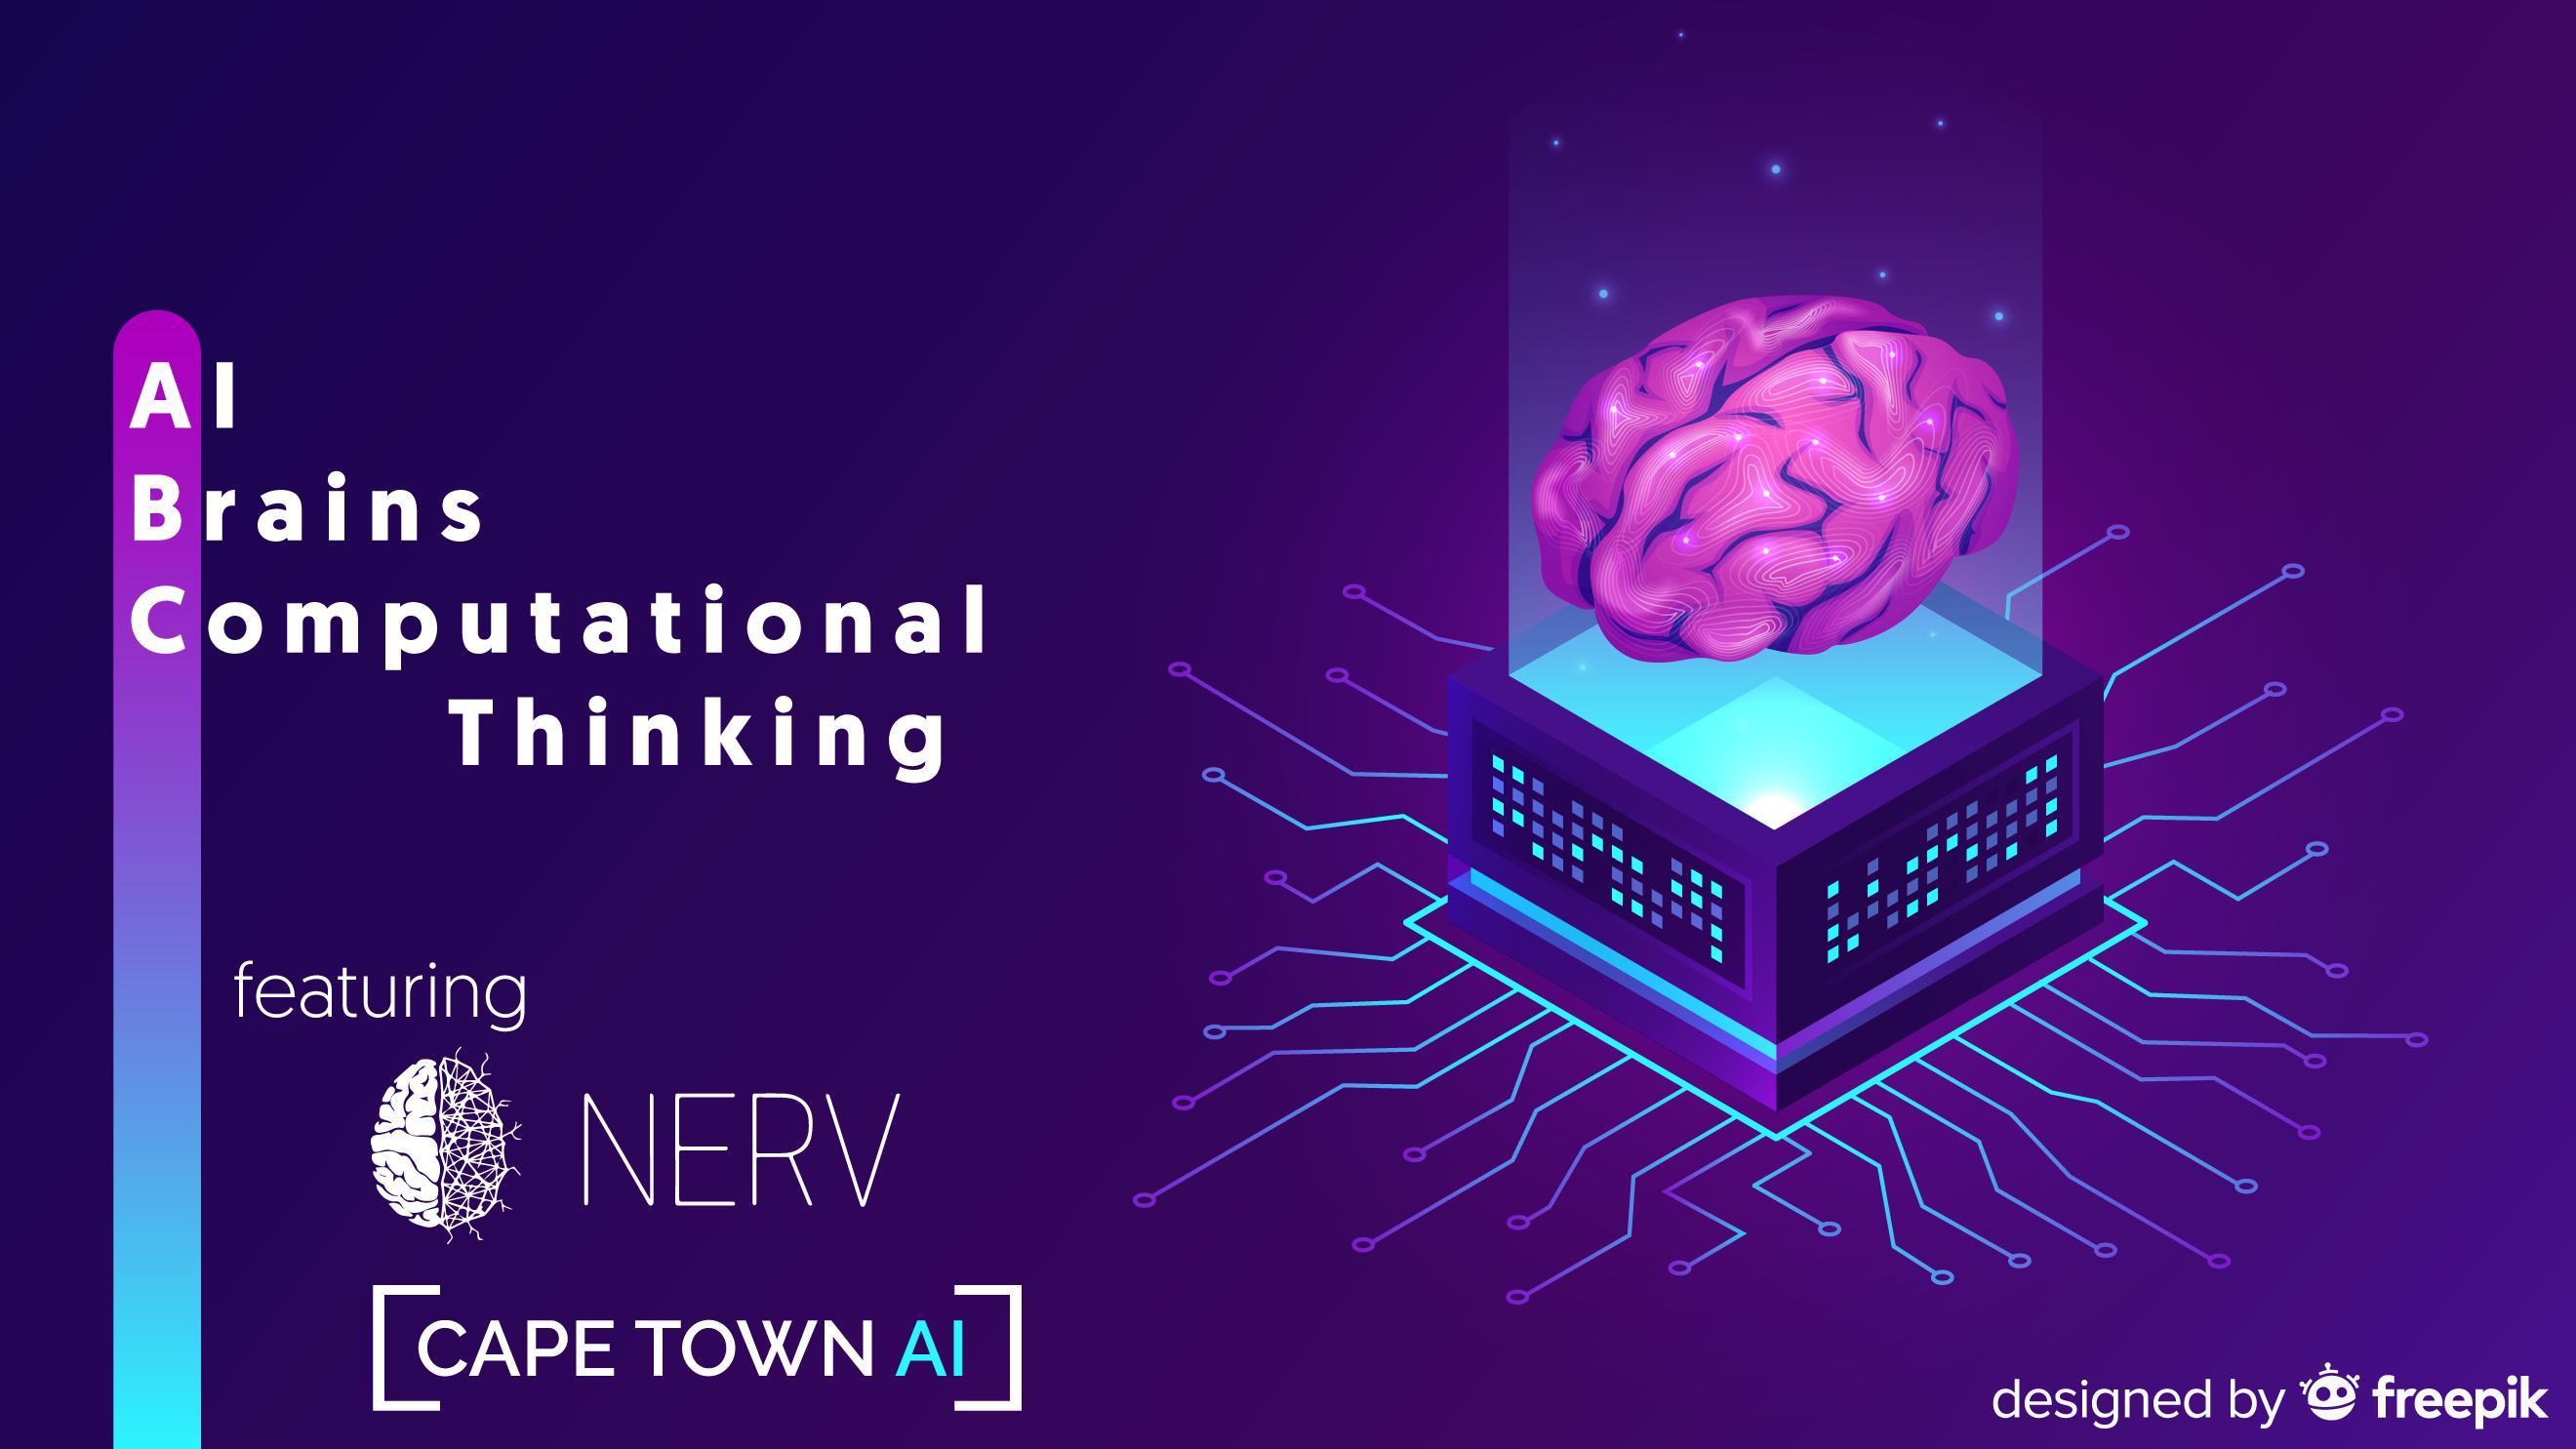 AI, Brains, & Computational Thinking (ABC)